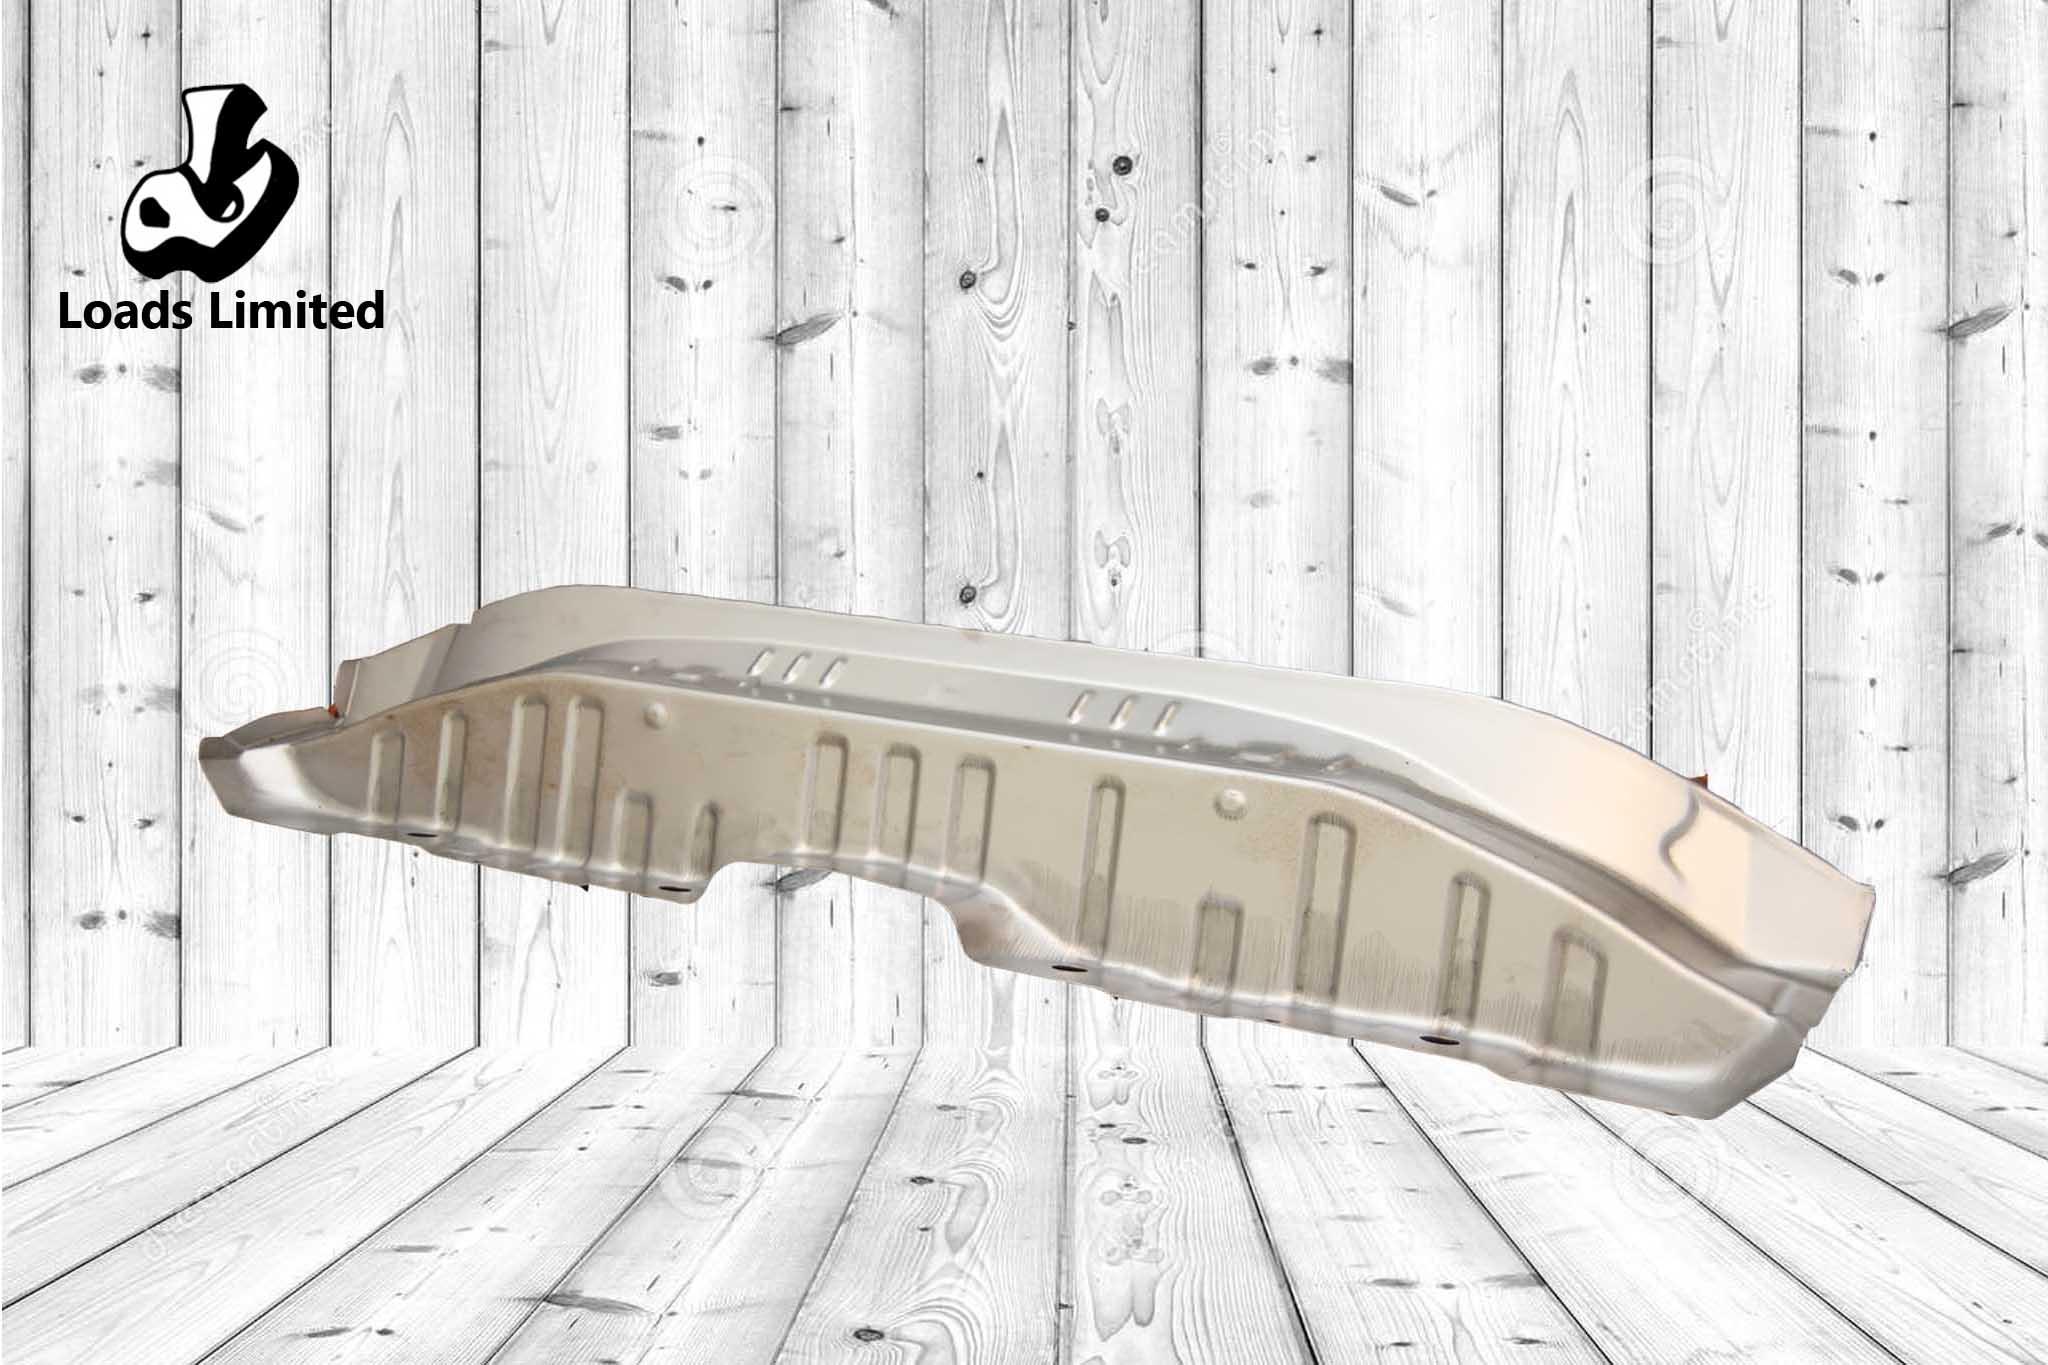 MBR RR FLR CROSS NO. 1 Size: SPC-D 0.9mm